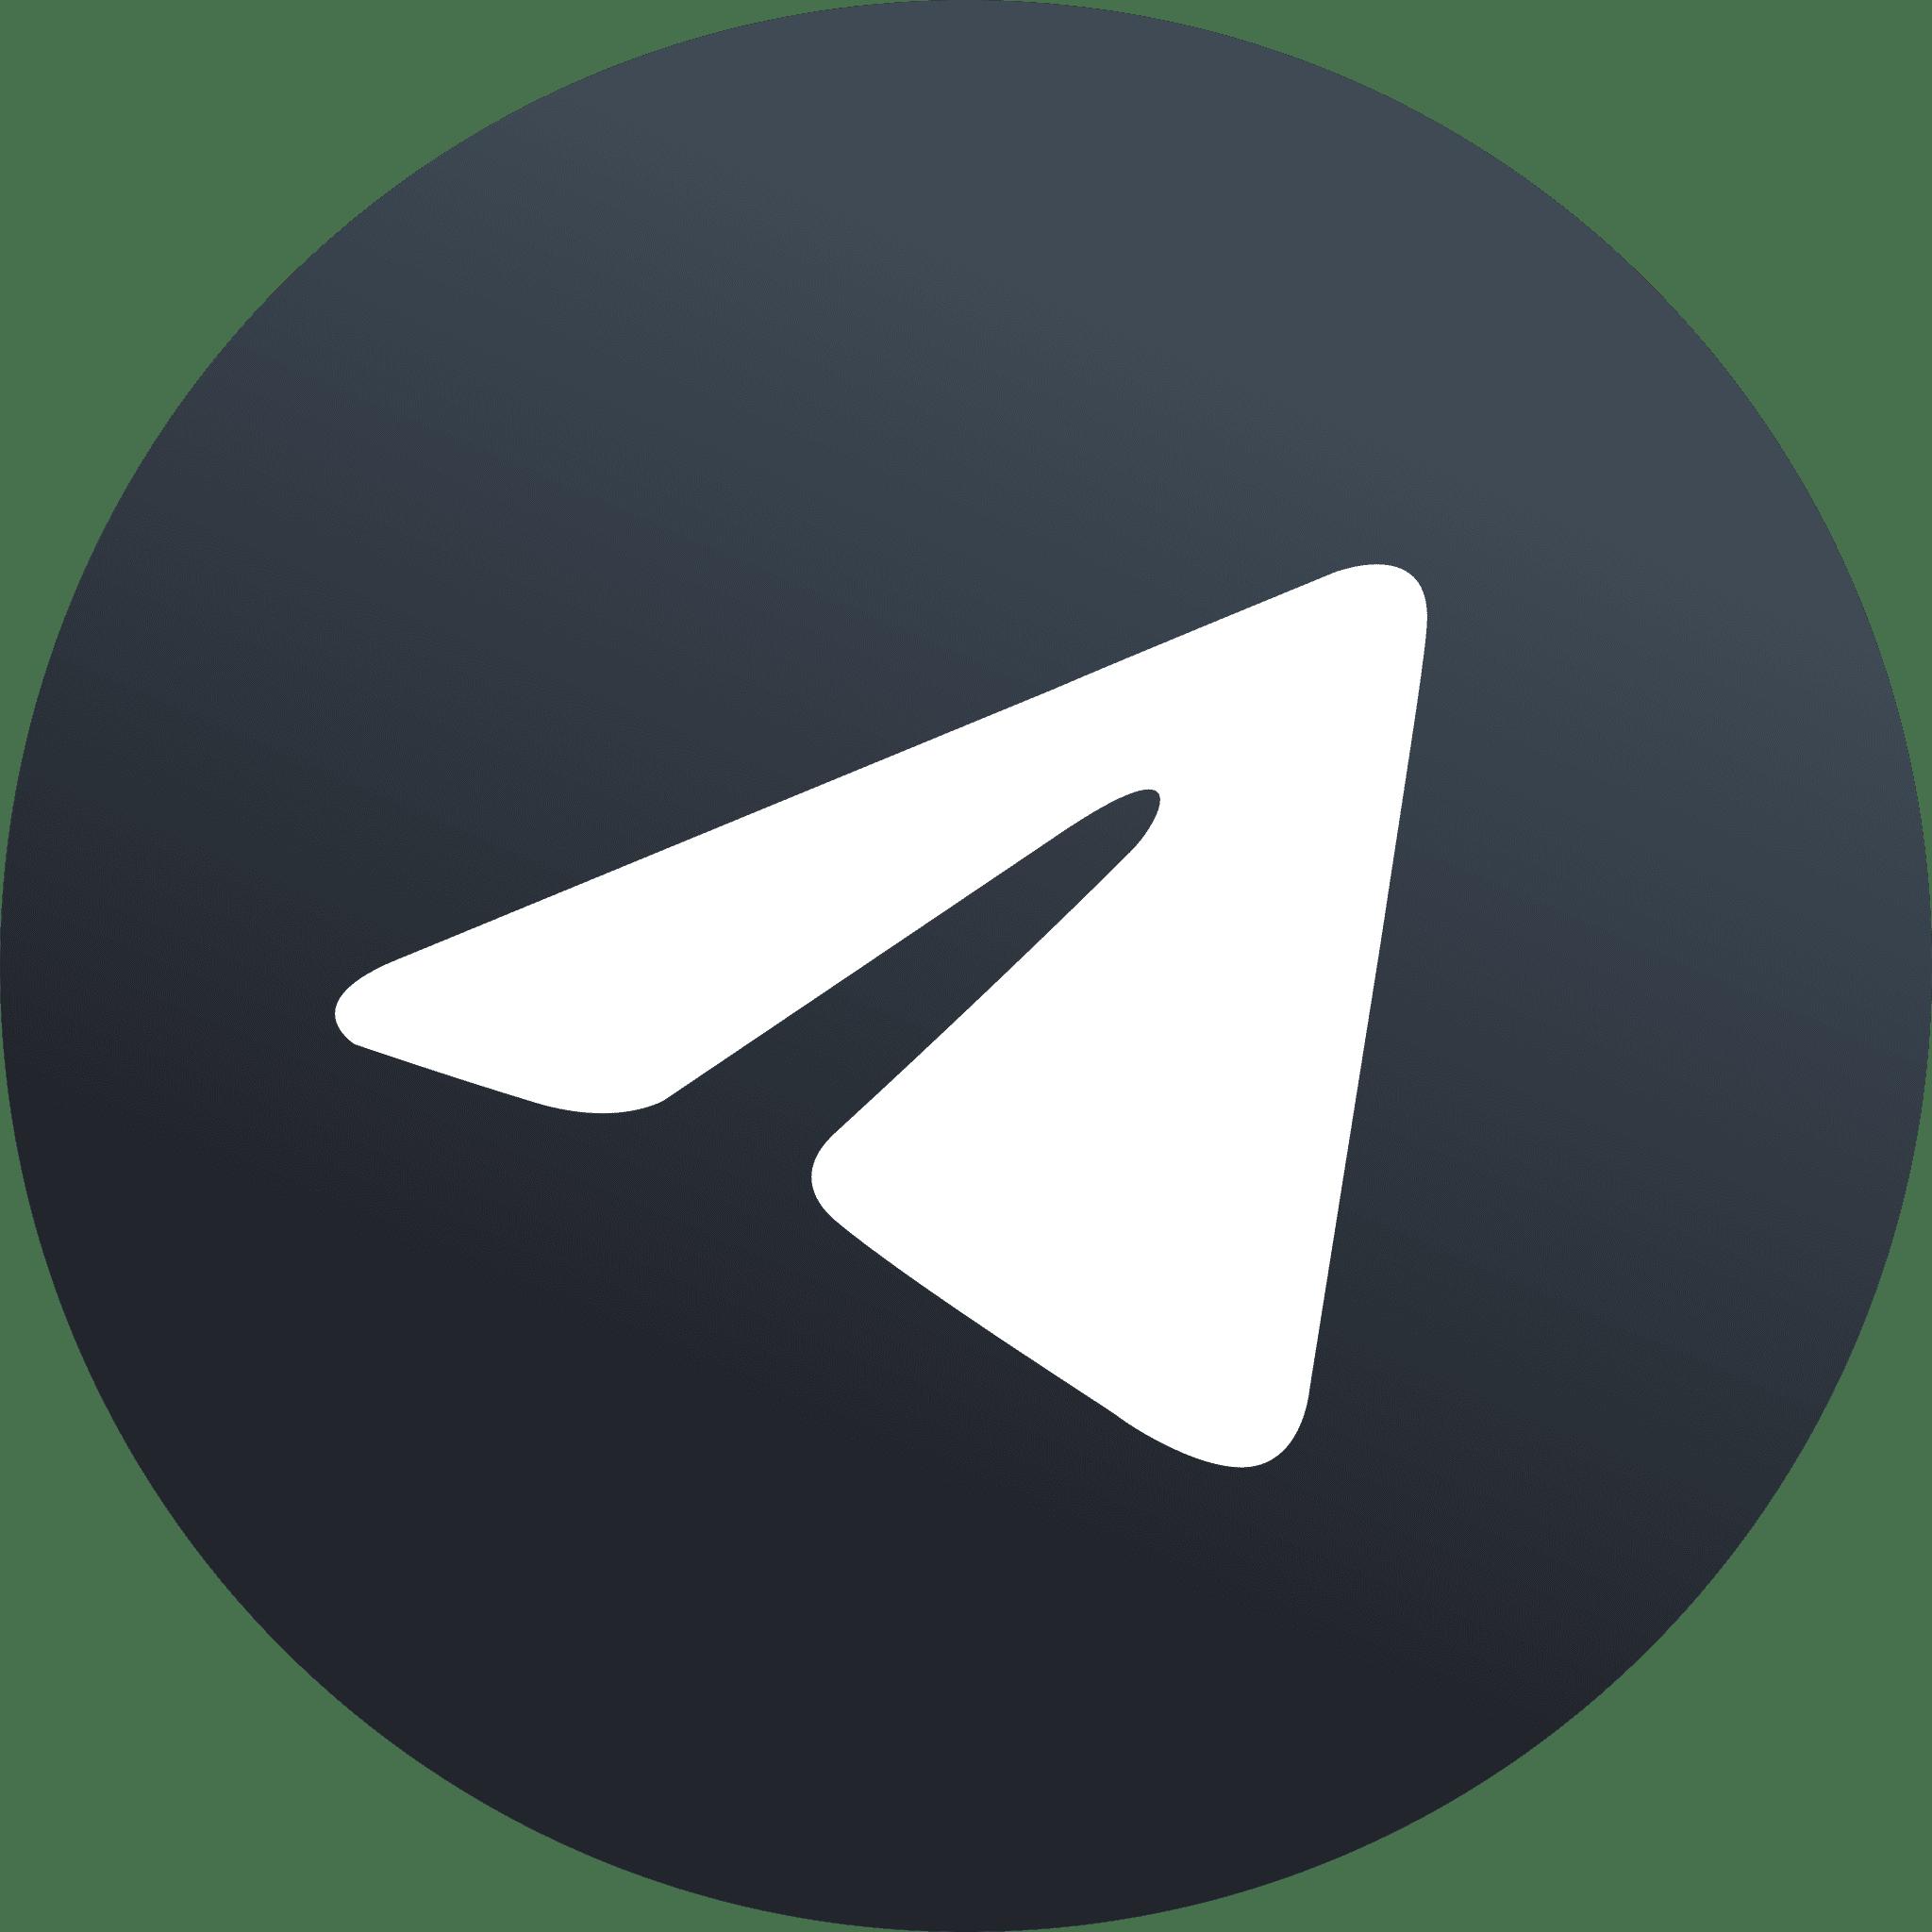 Telegram (Ελληνικό Κανάλι)